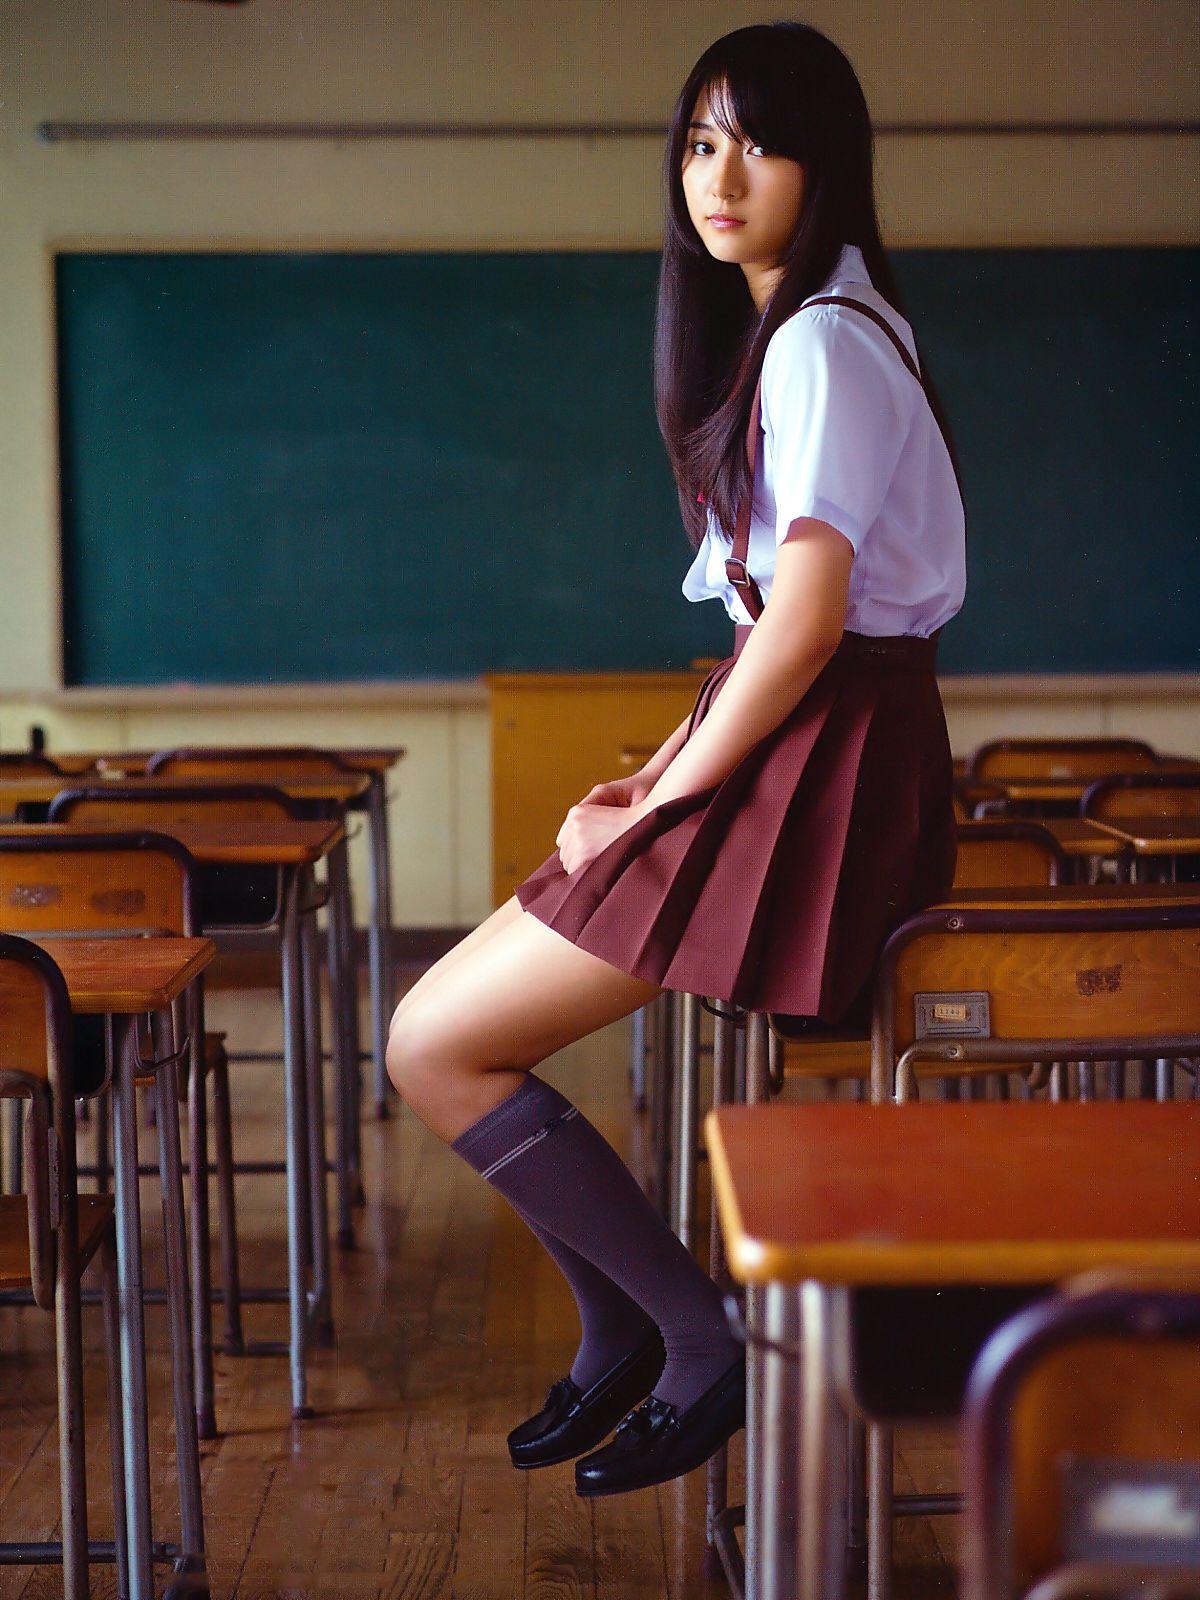 Asian gallery uniform